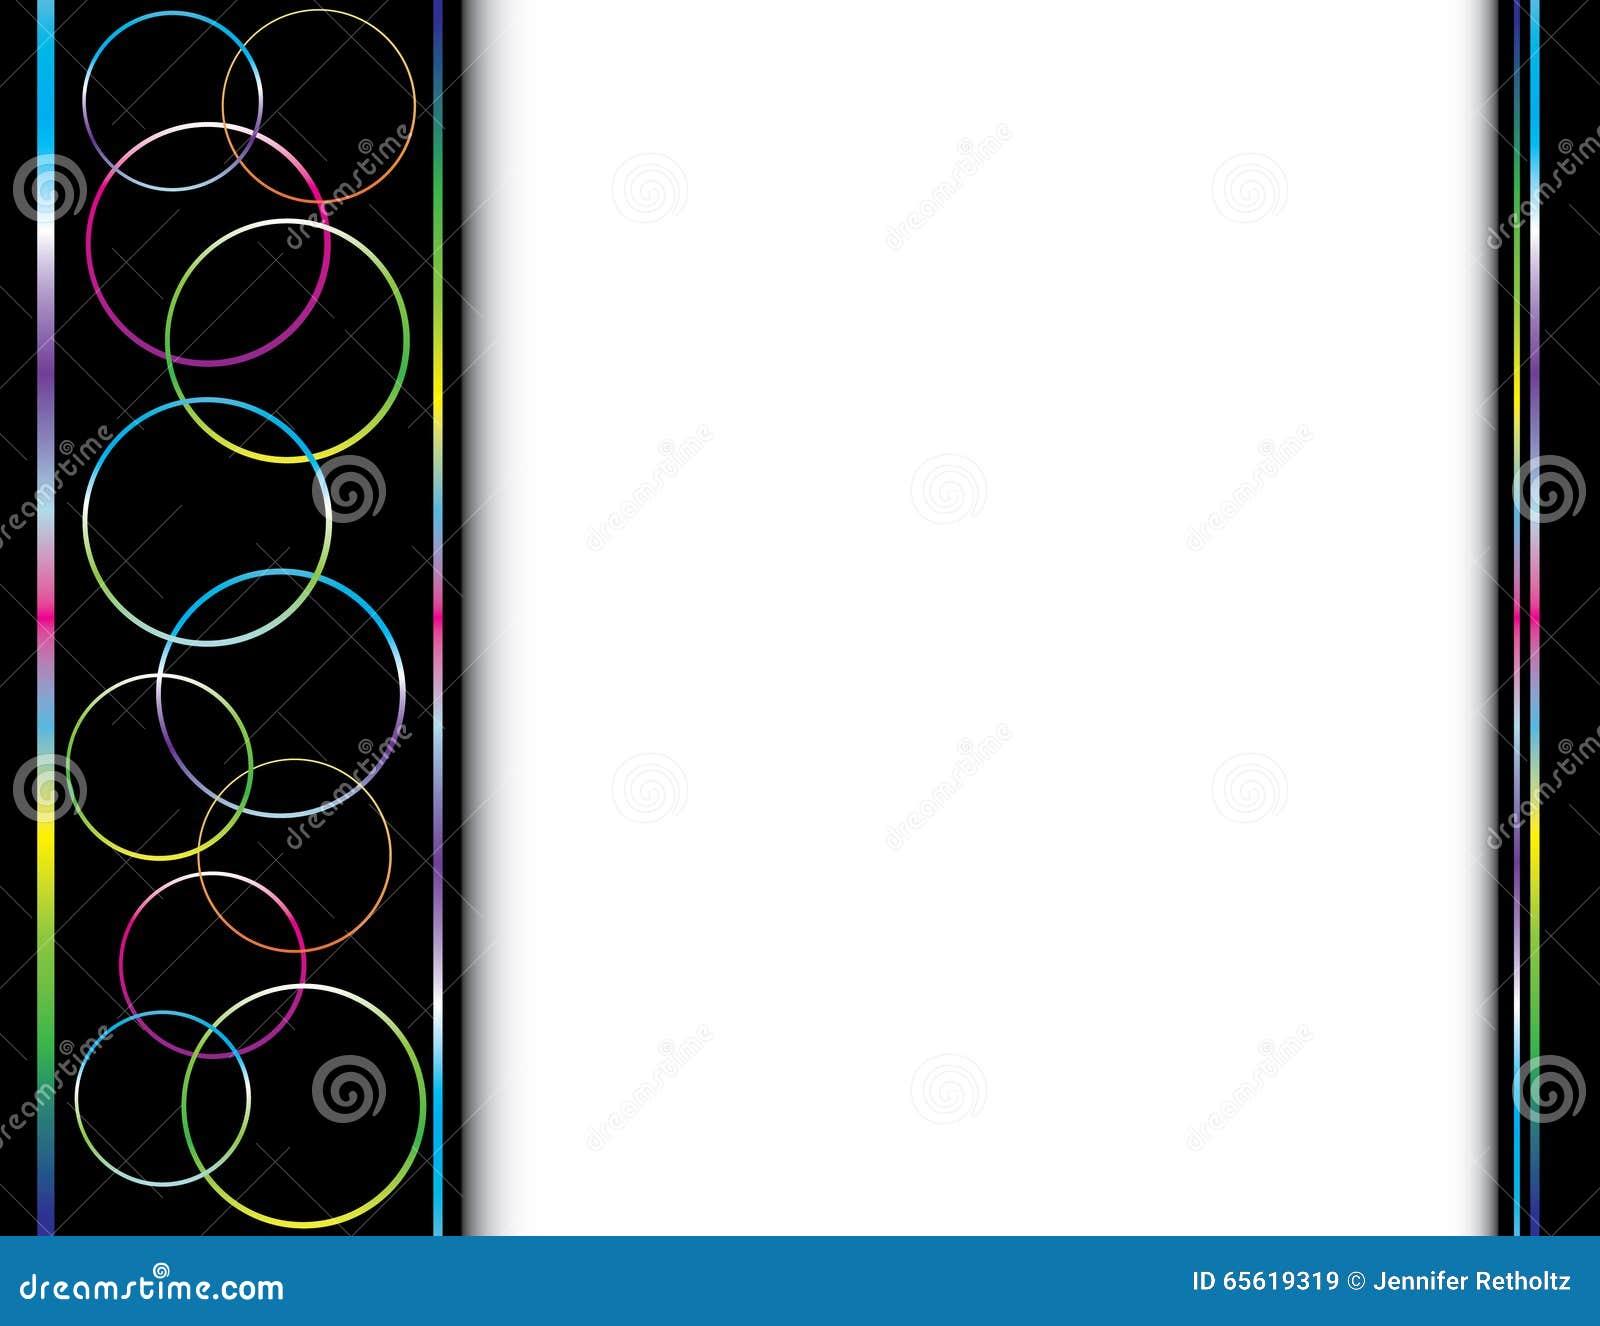 black rainbow border background stock illustration illustration of